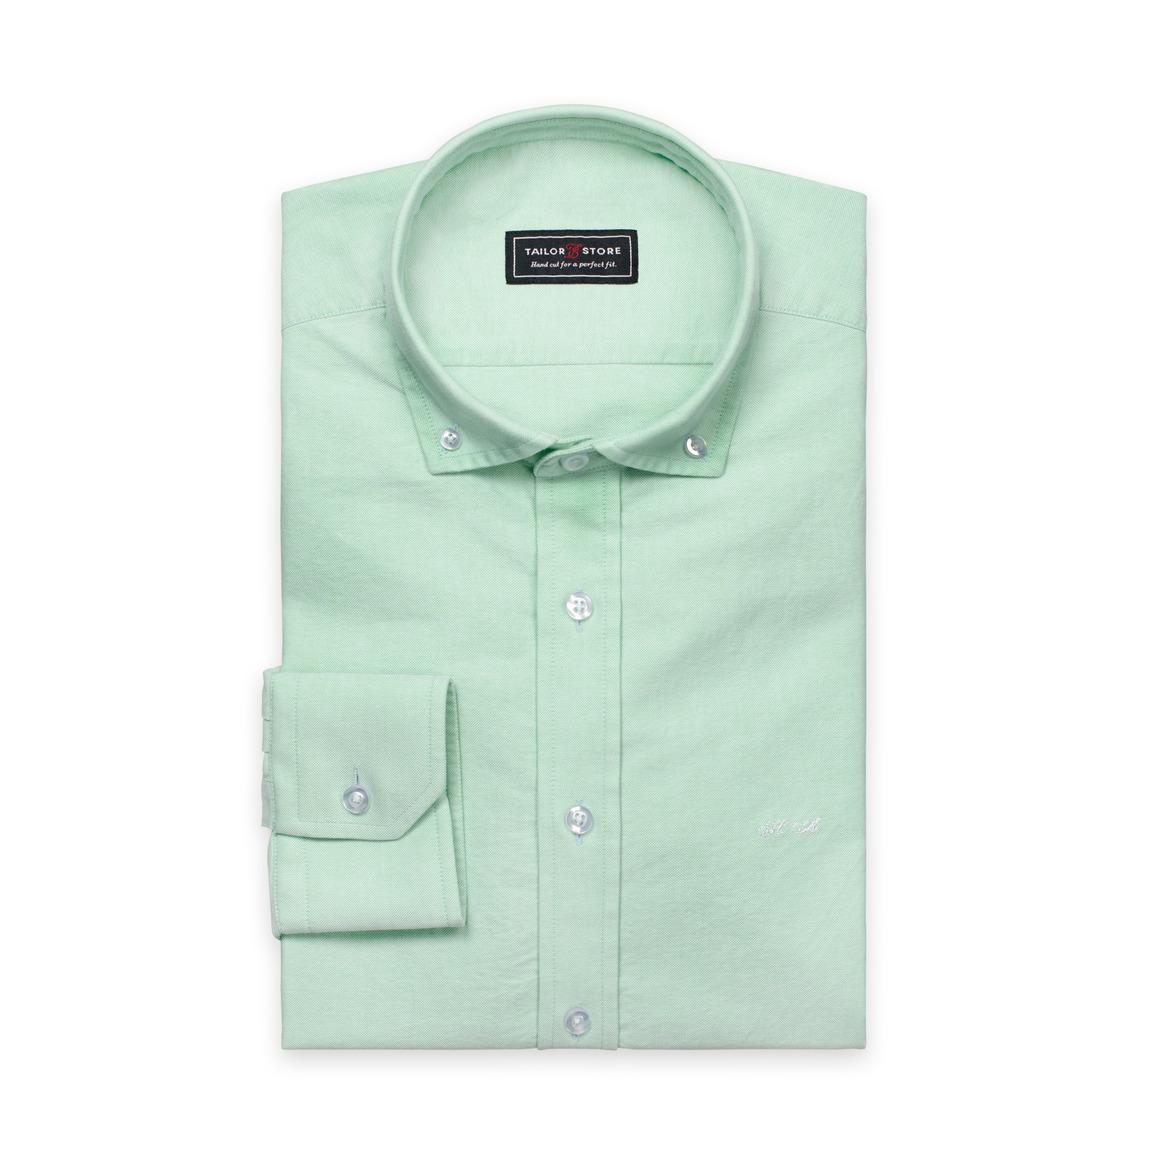 Green button-down Oxford shirt